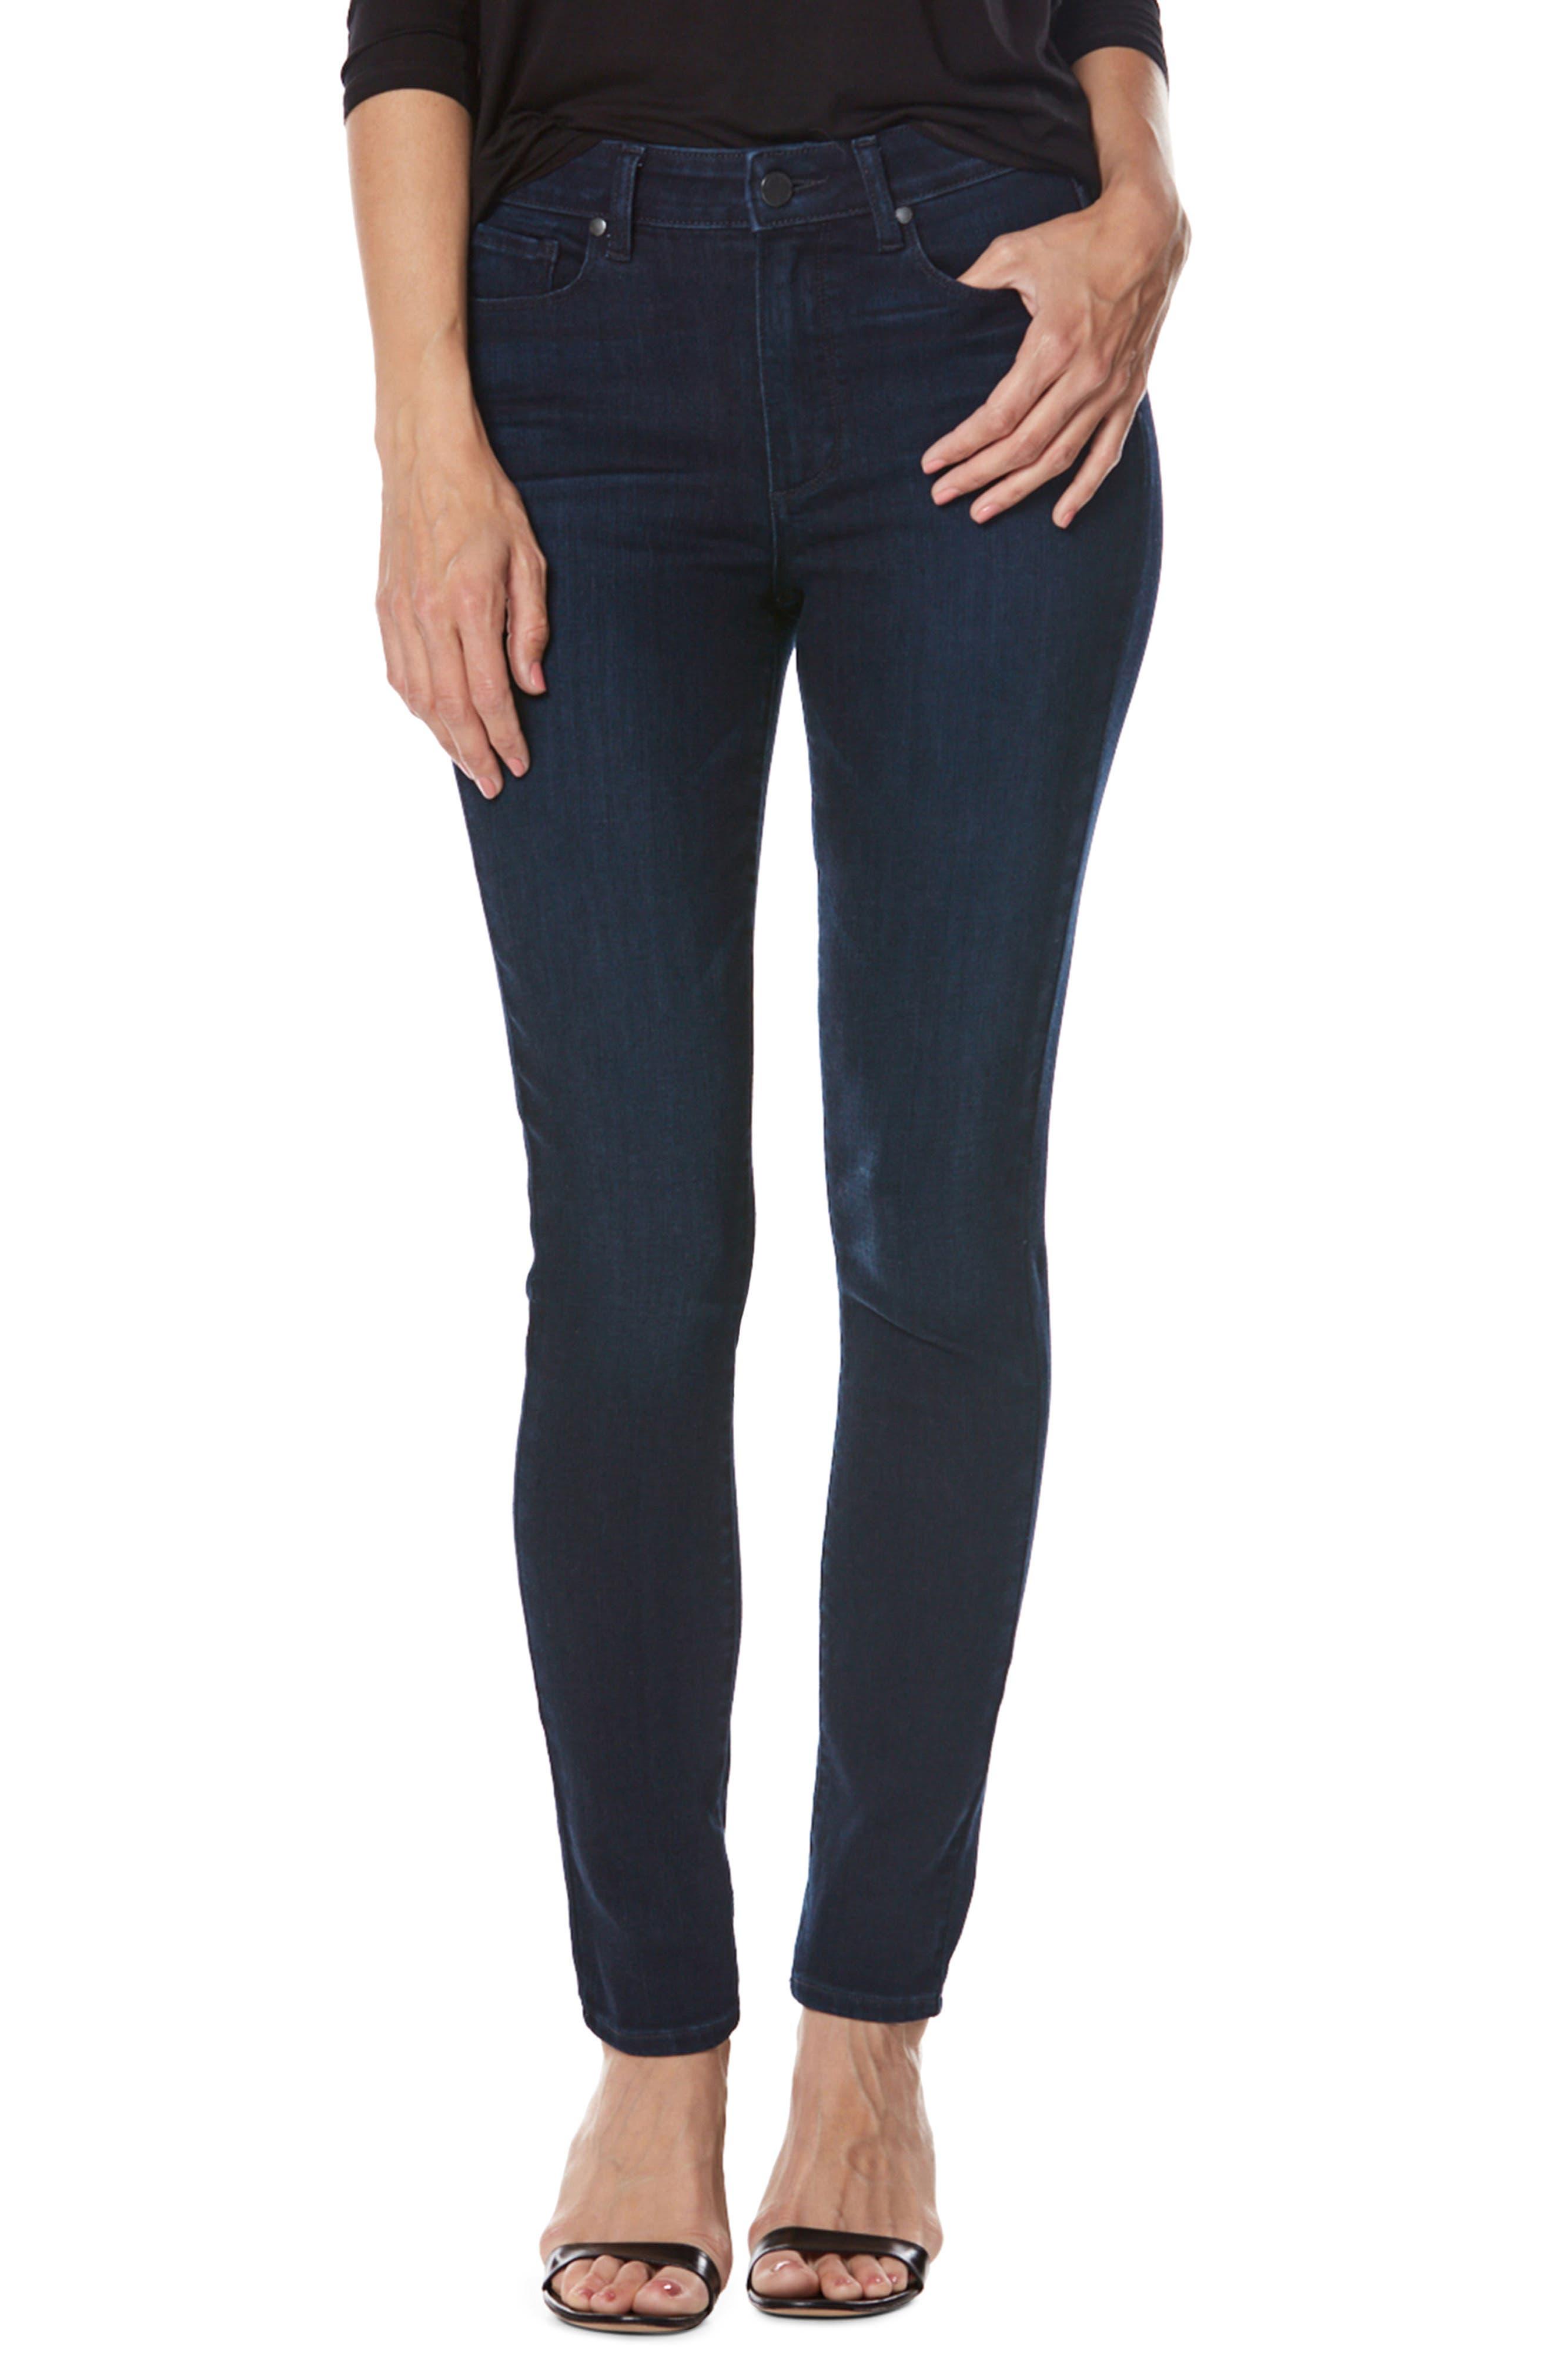 Transcend - Hoxton High Waist Ultra Skinny Jeans,                             Main thumbnail 1, color,